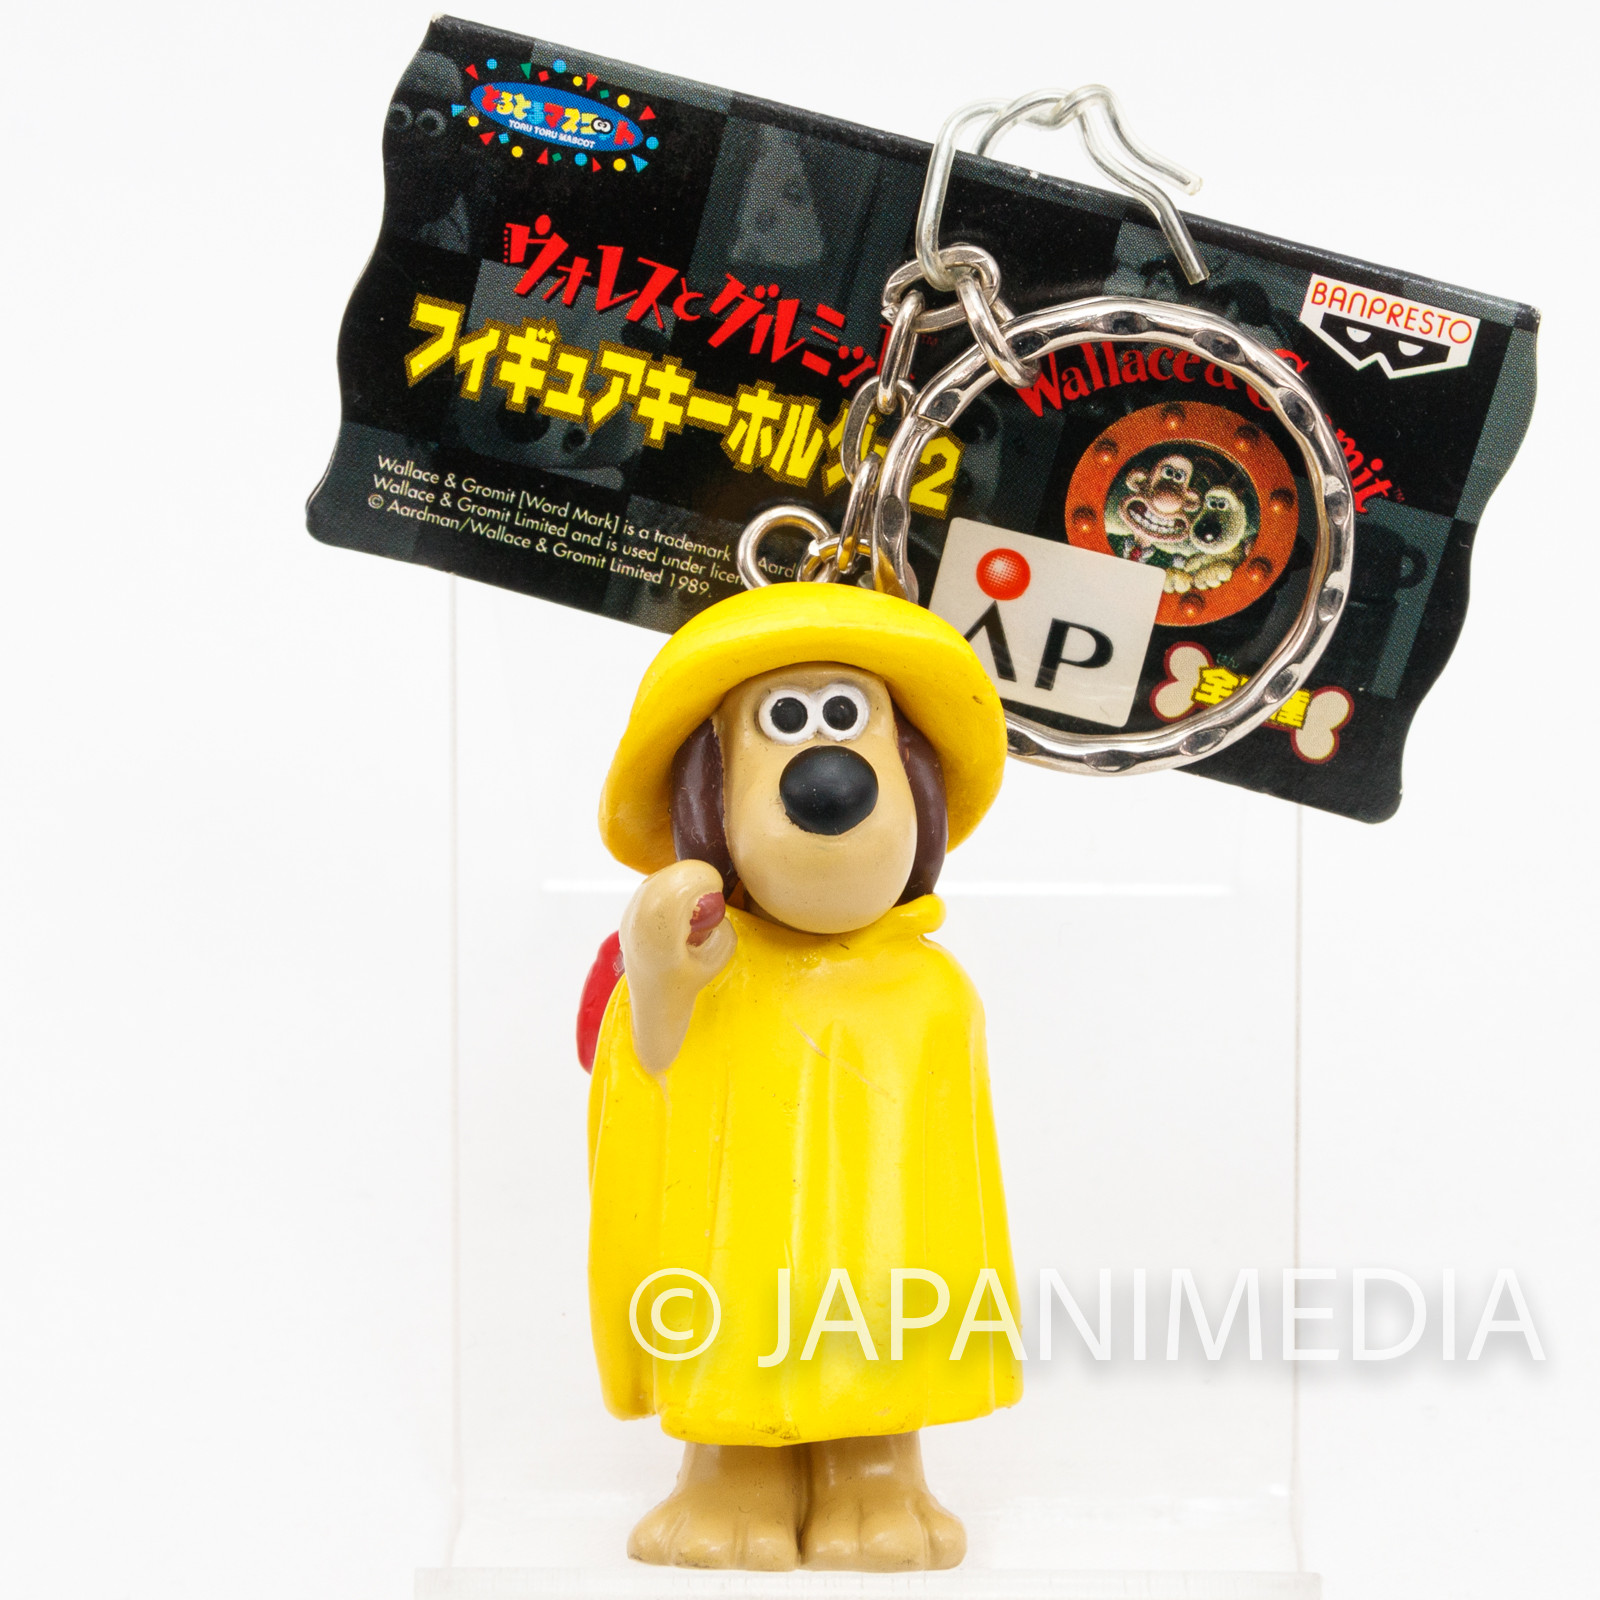 Wallace & Gromit Raincoat Gromit Figure Key Chain 2 Banpresto JAPAN Ardman ANIME